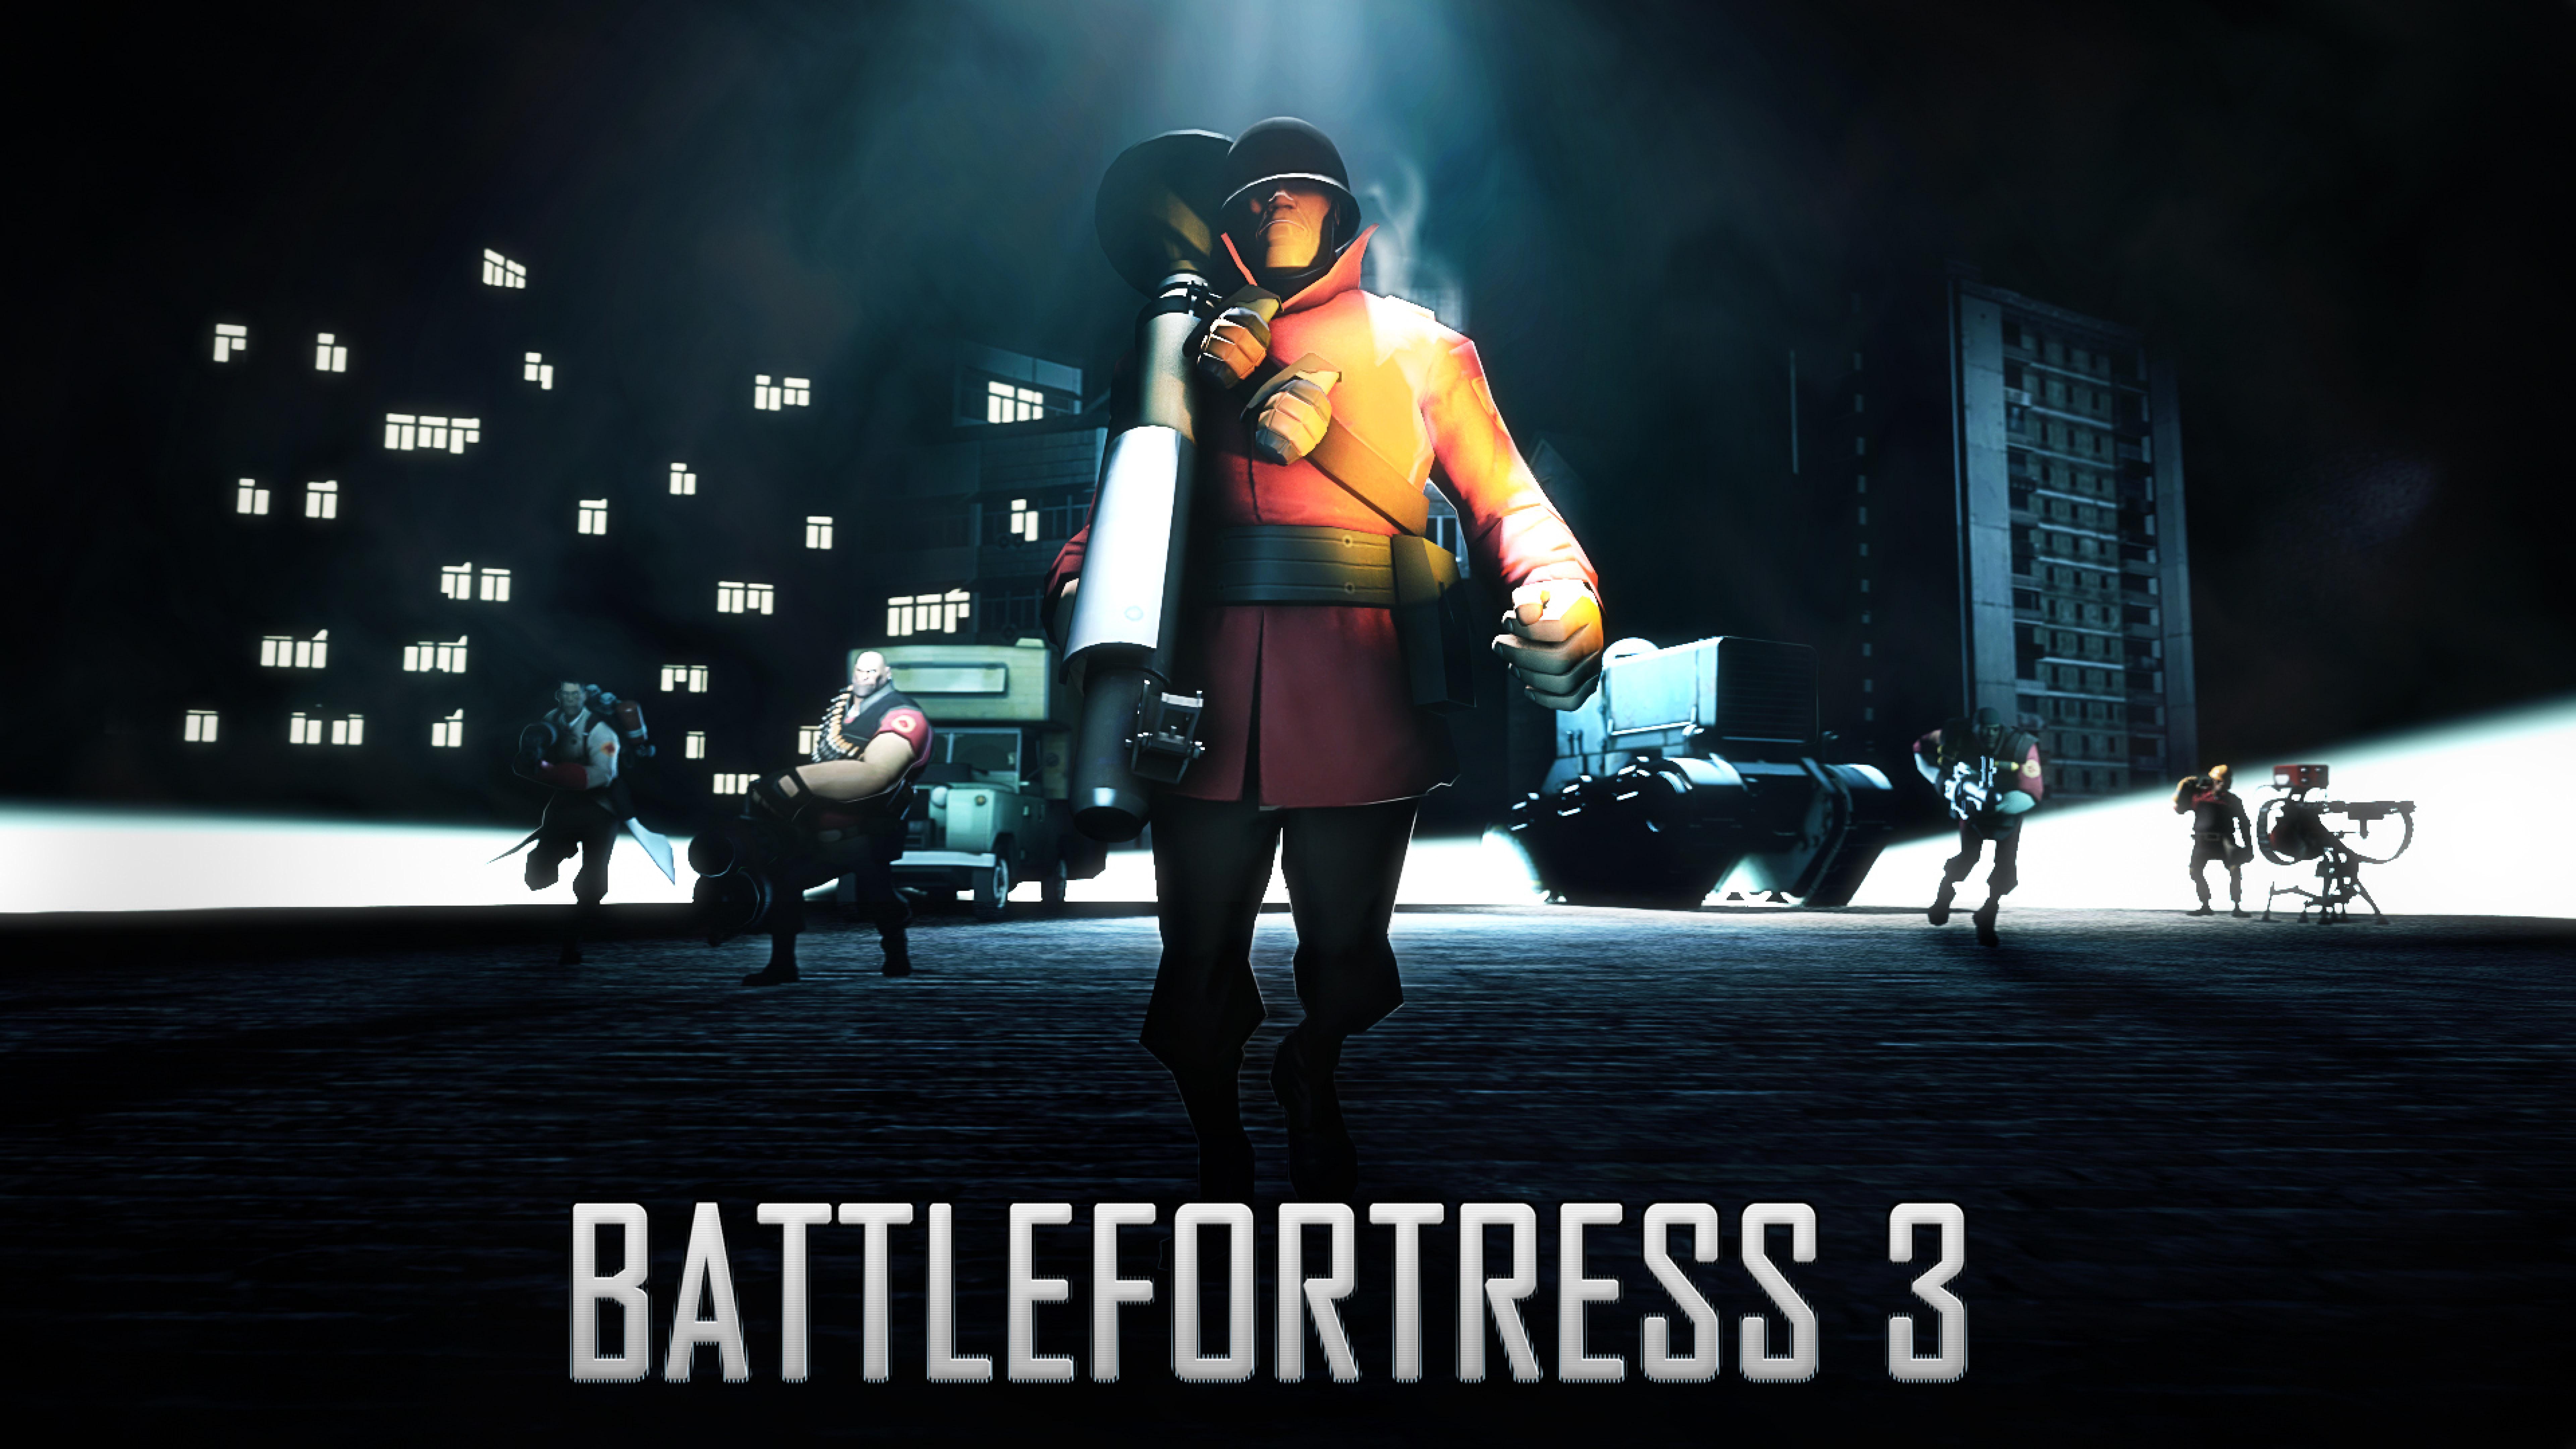 7680x4320 Battlefortress 3 Team Fortress 2 Battlefield 8k